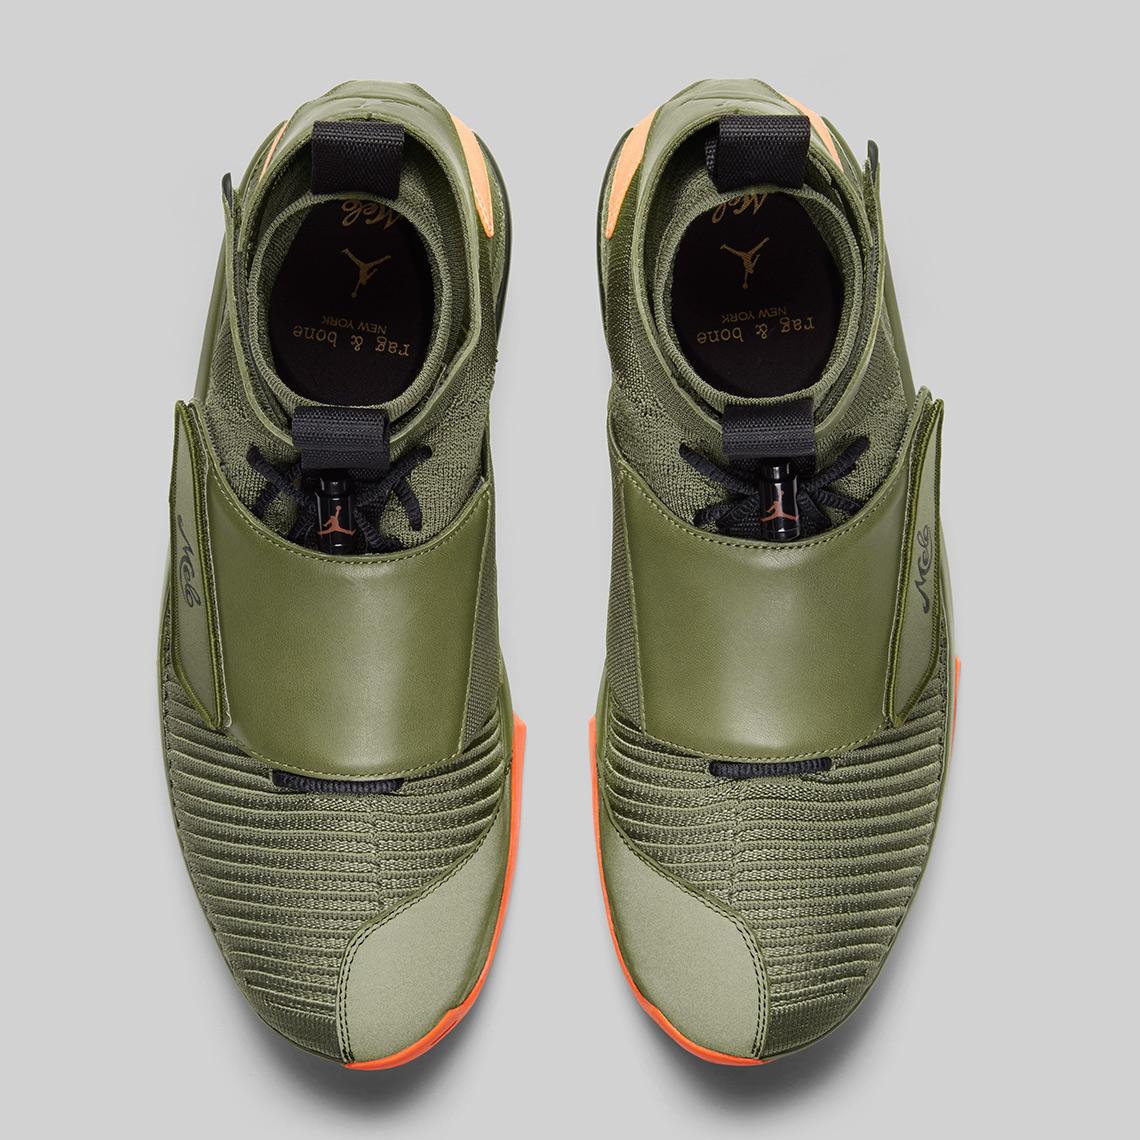 5e924f72b000 Carmelo Anthony Rag And Bone Air Jordan 20 Flyknit Release Info ...